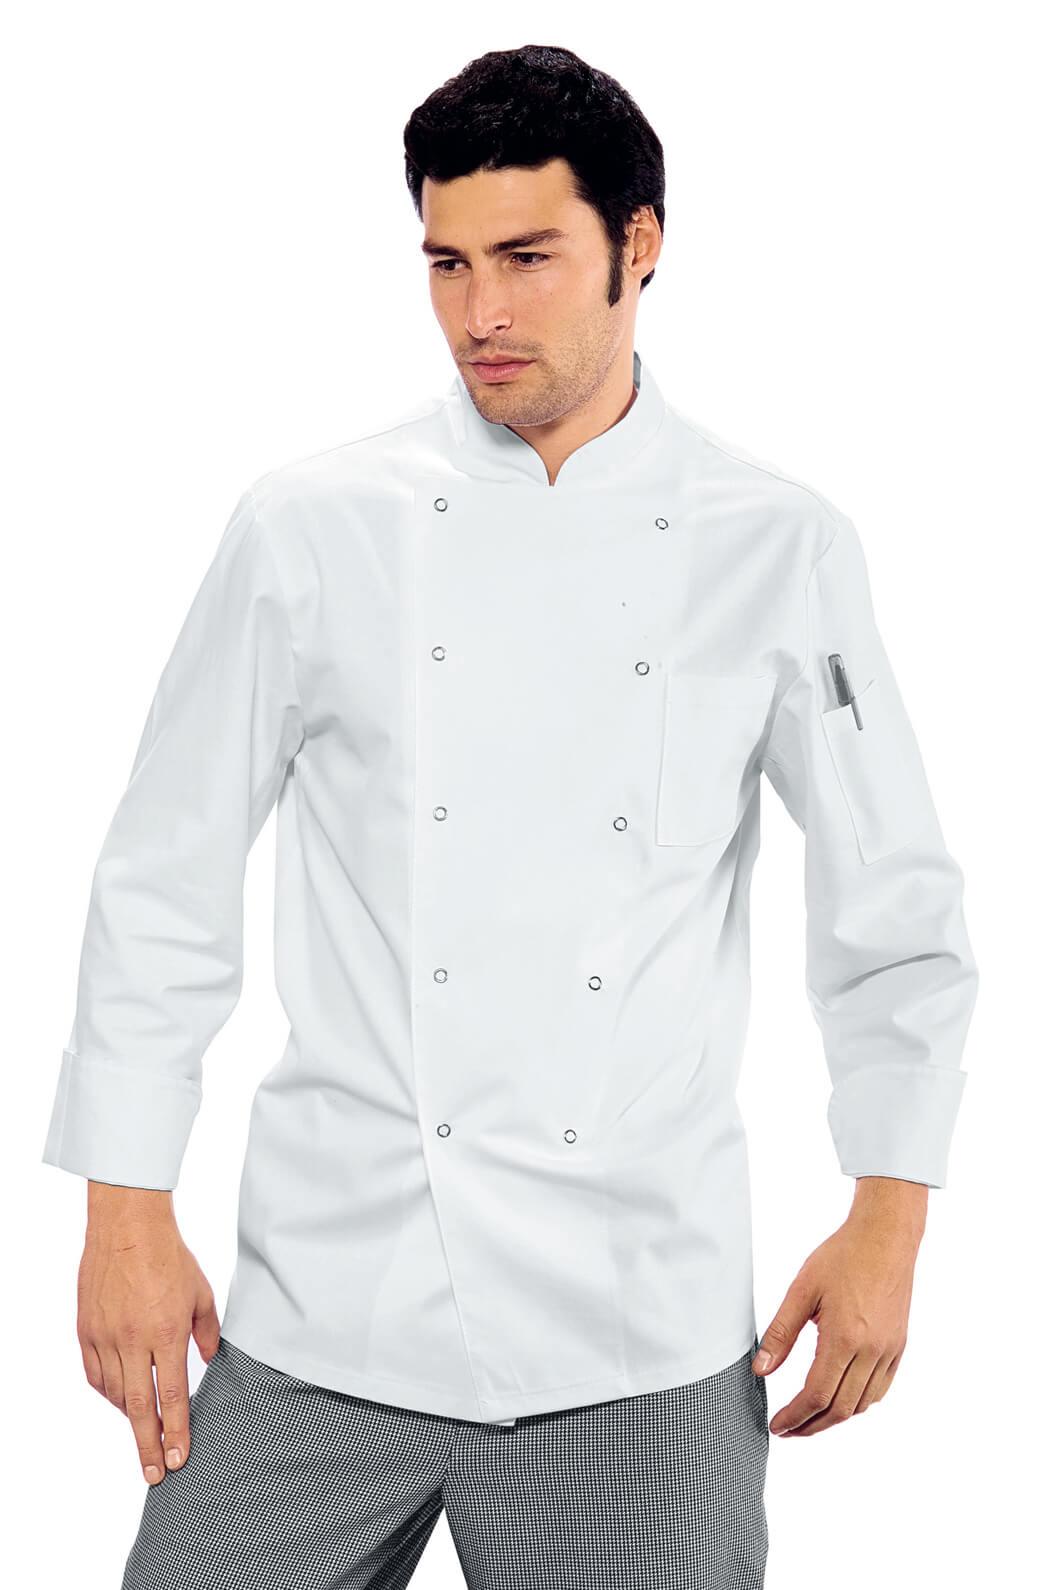 ISACCO Veste de cuisine blanche 100% Coton